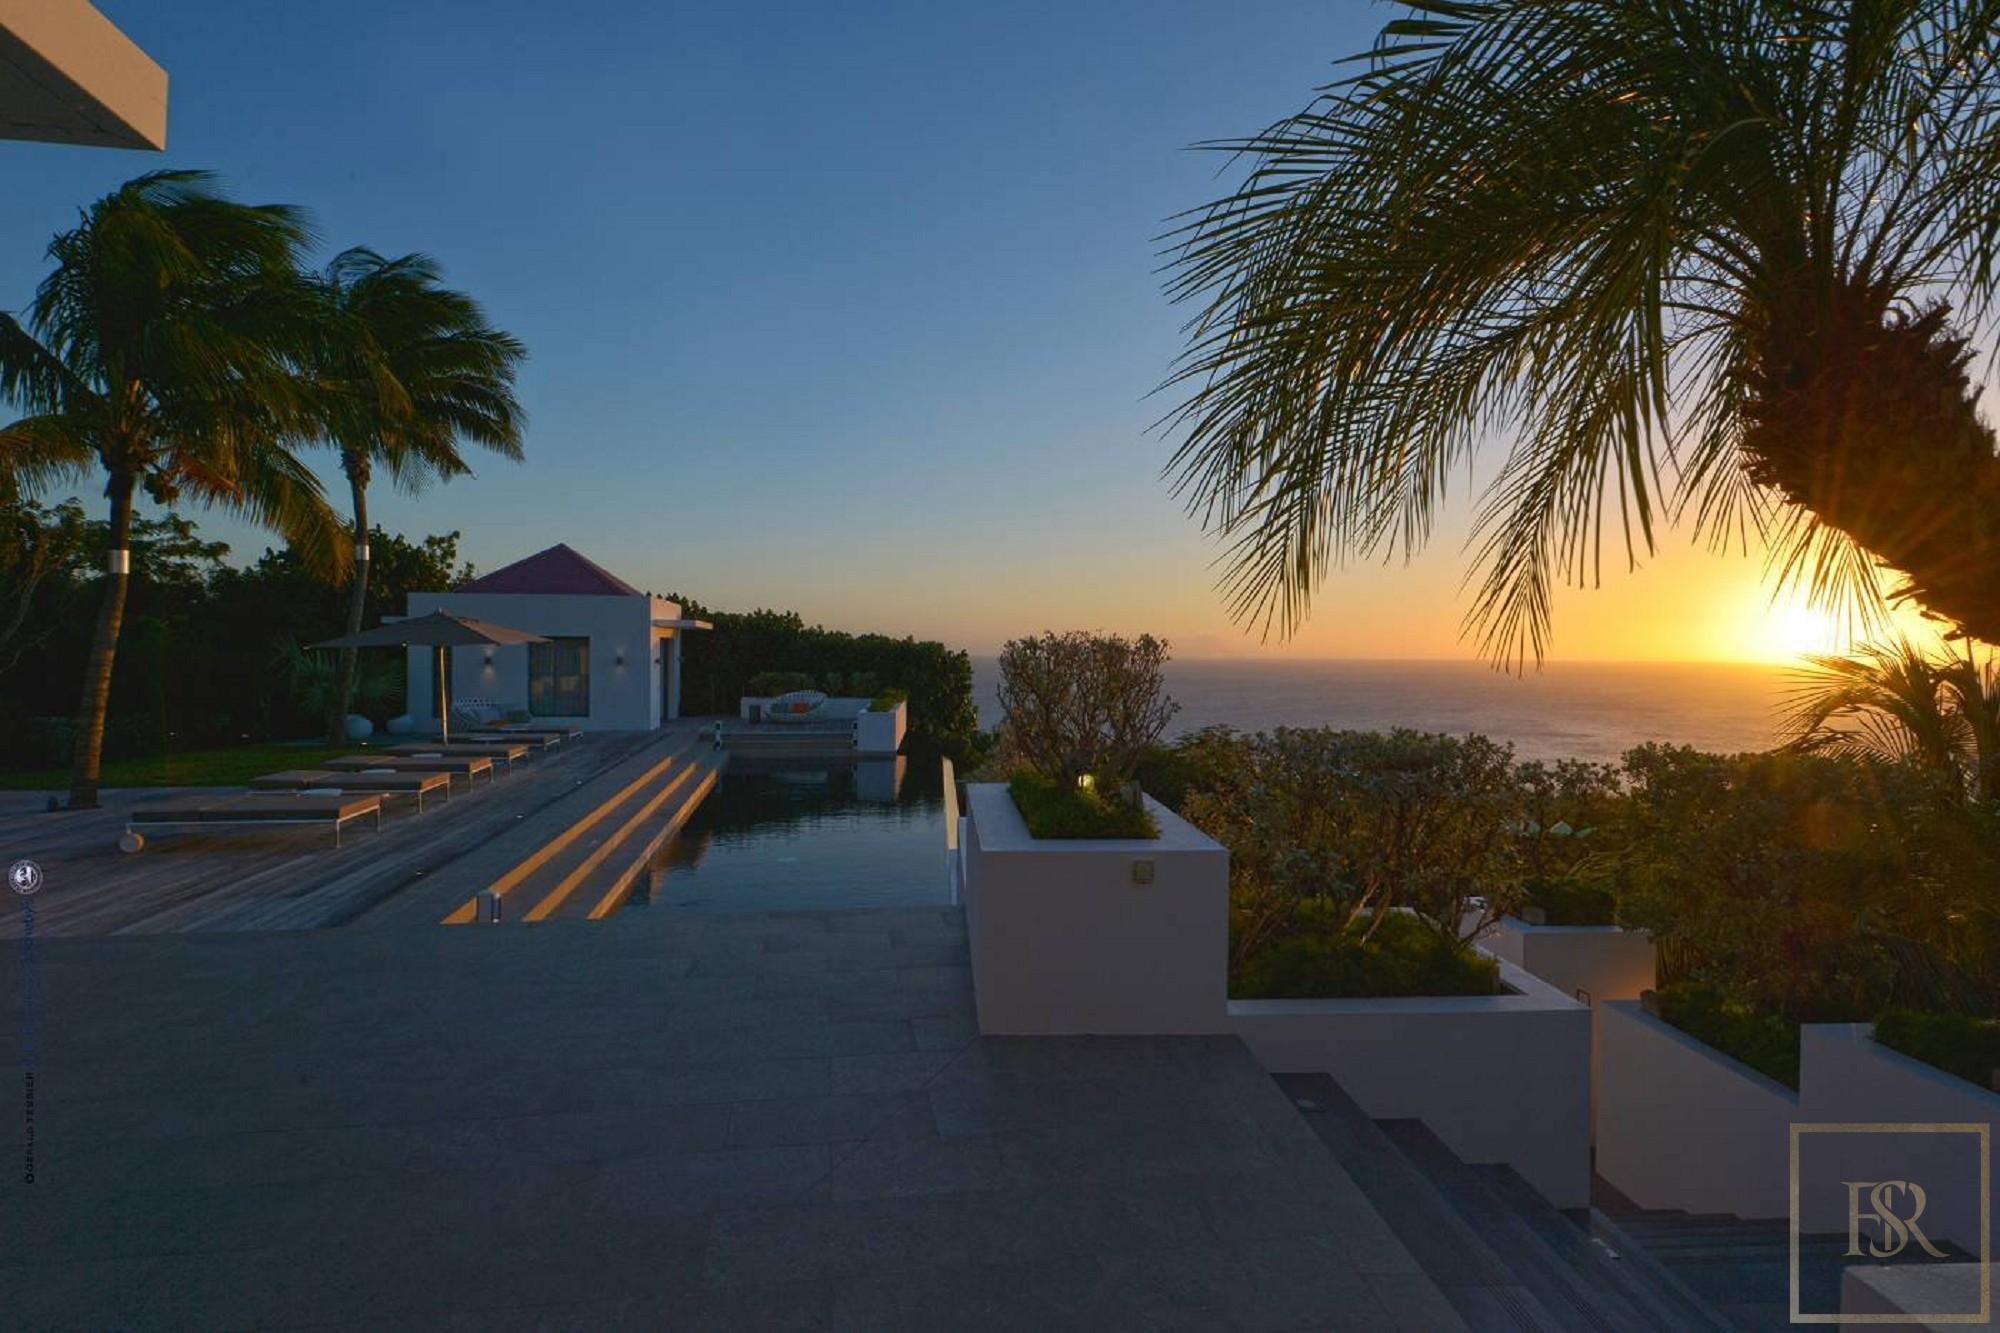 Villa Gem Palm 5 BR - Gouverneur, St Barth / St Barts rental For Super Rich